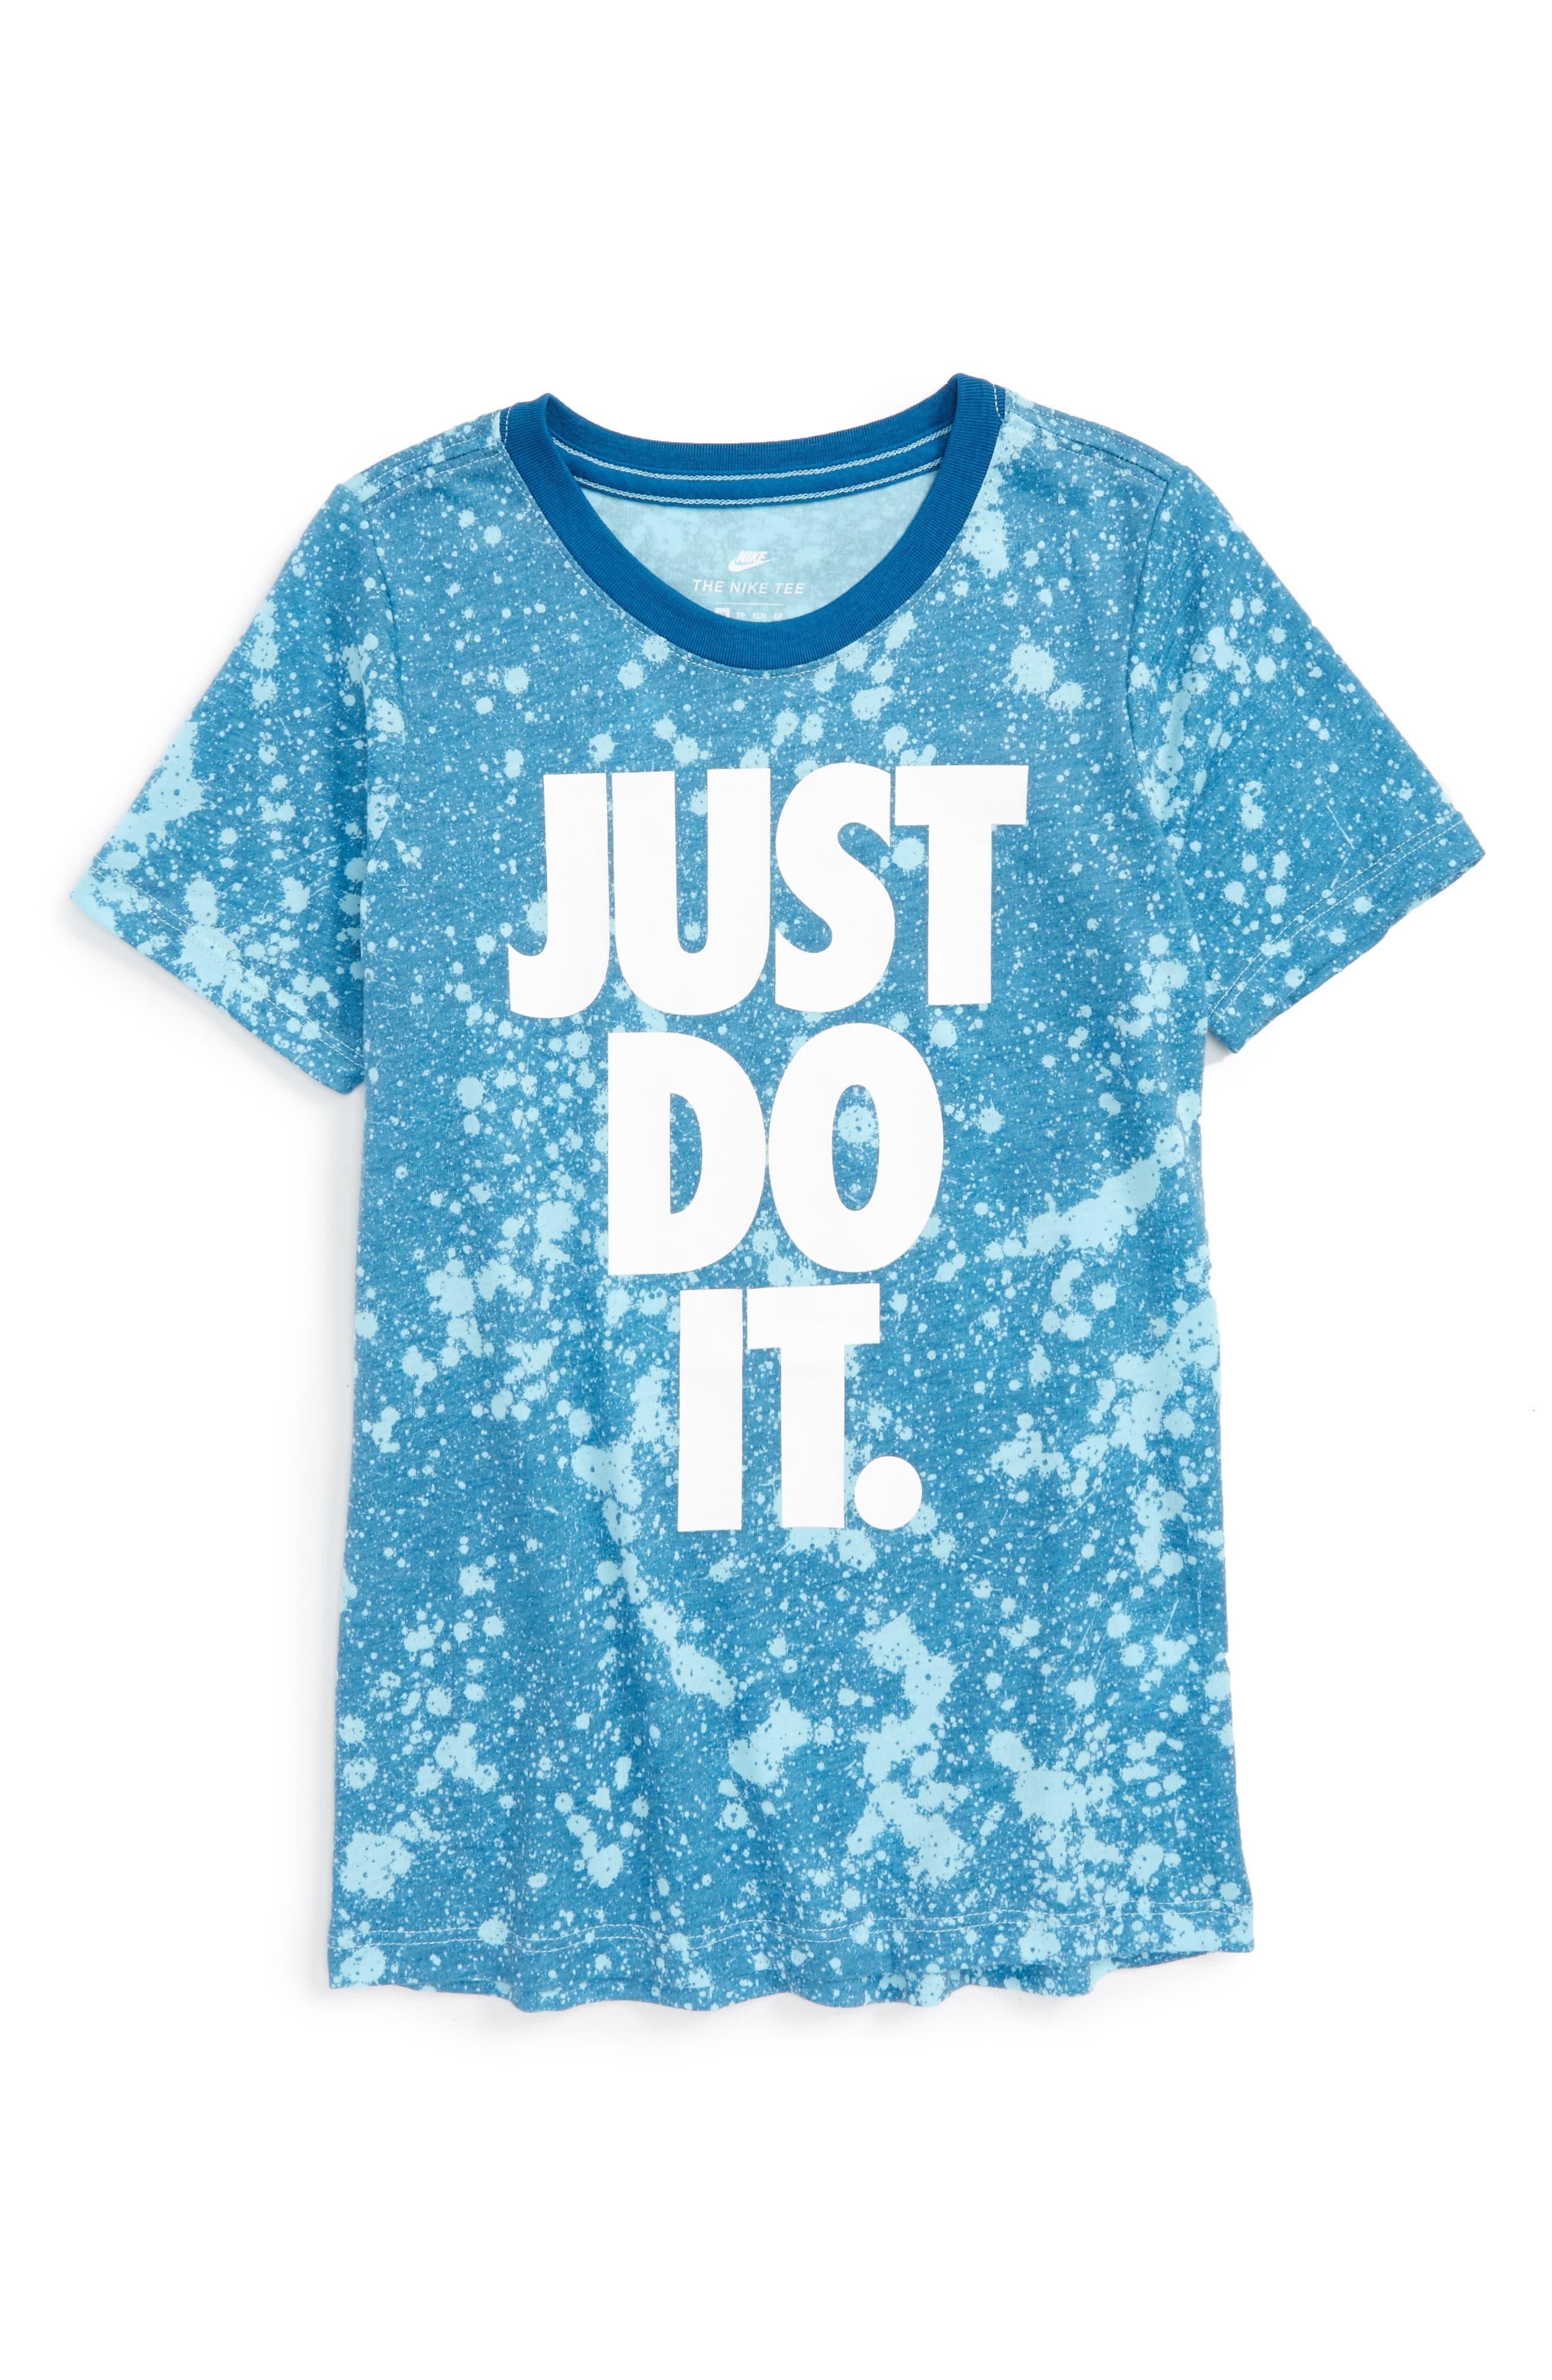 Nike Sportswear Just Do It Graphic T-Shirt (Little Boys & Big Boys)